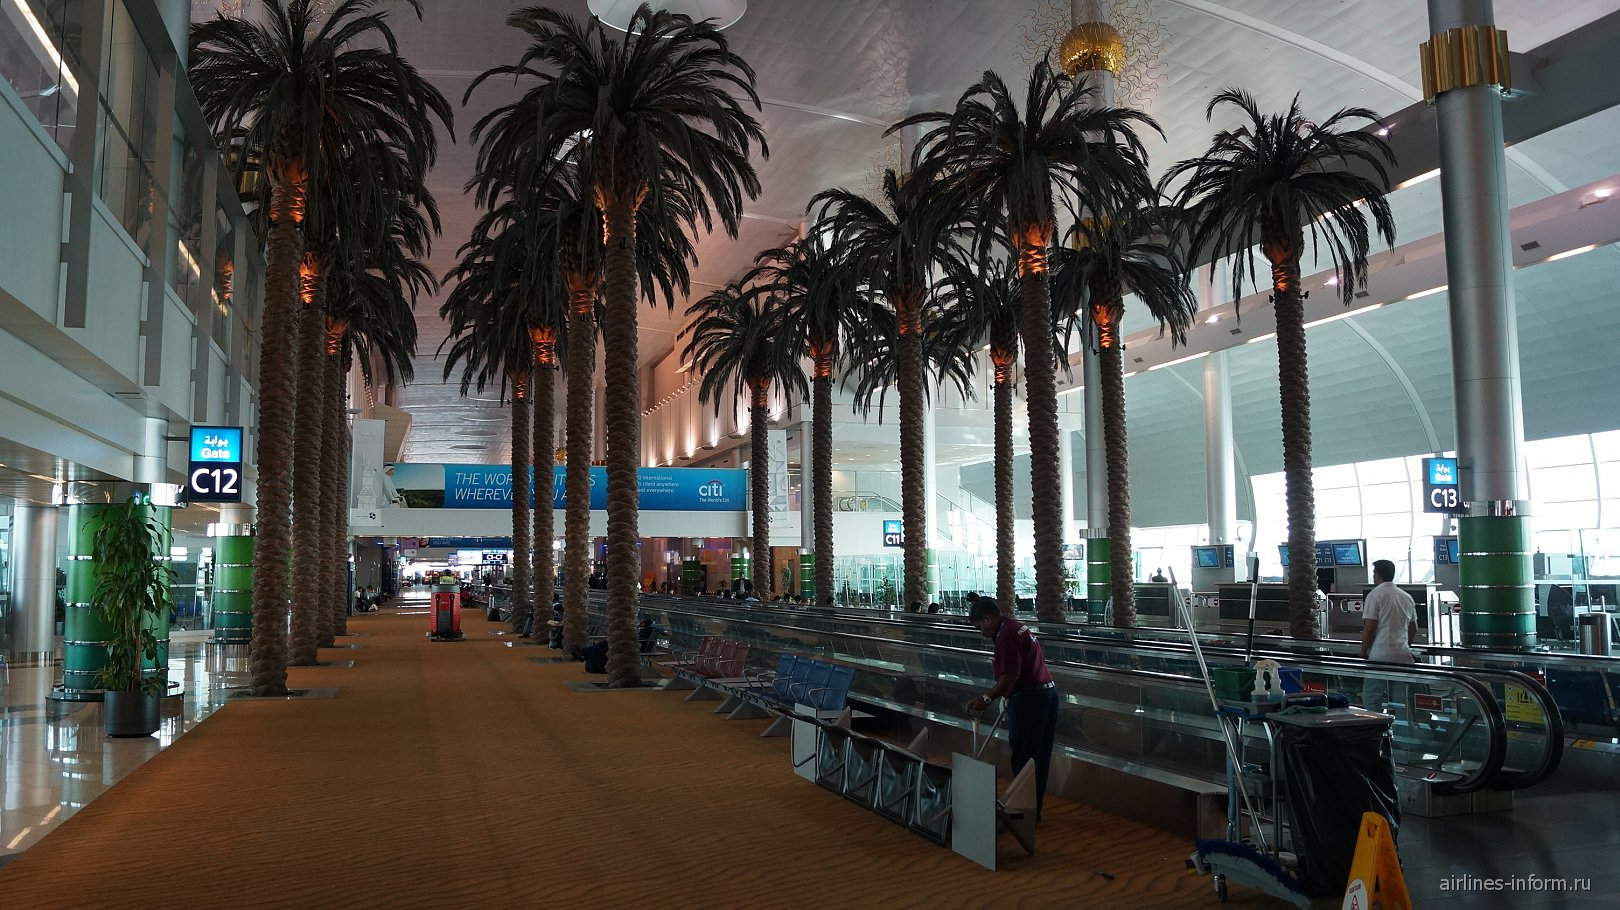 В терминале 3 аэропорта Дубай